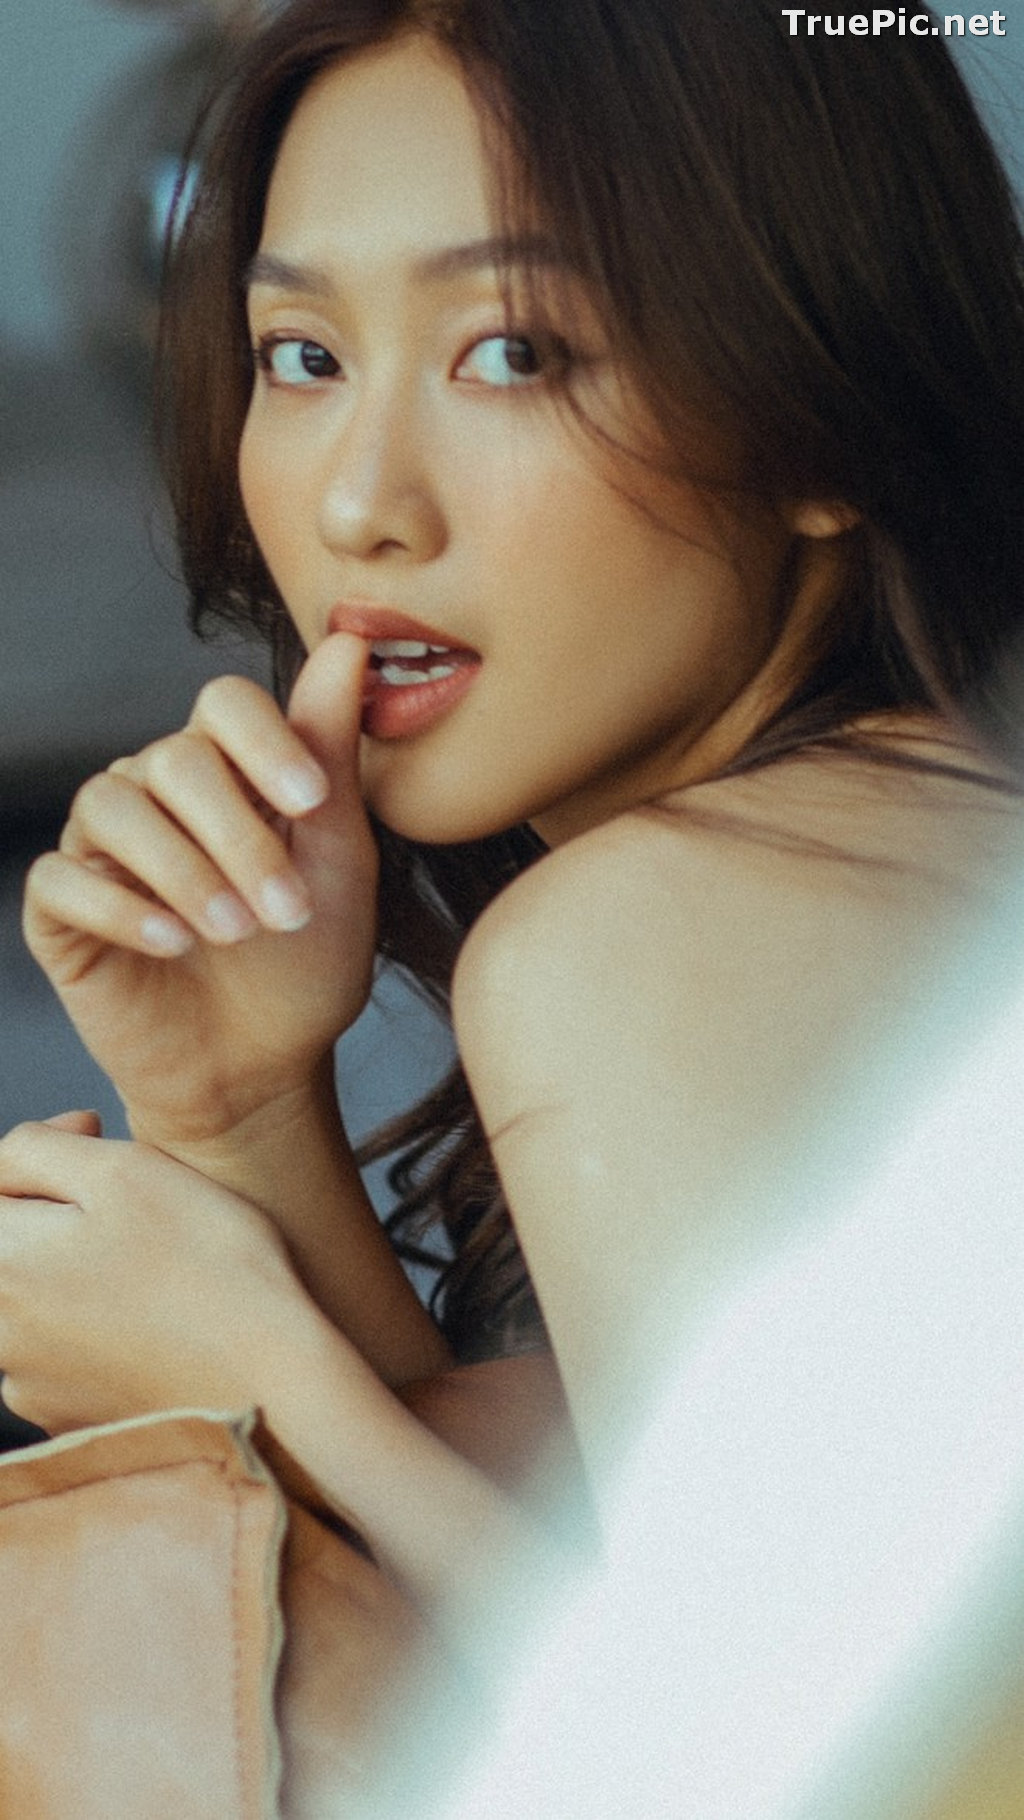 Image Vietnamese Hot Girl - Kha Ngan - Gentle Young Charming - TruePic.net - Picture-9